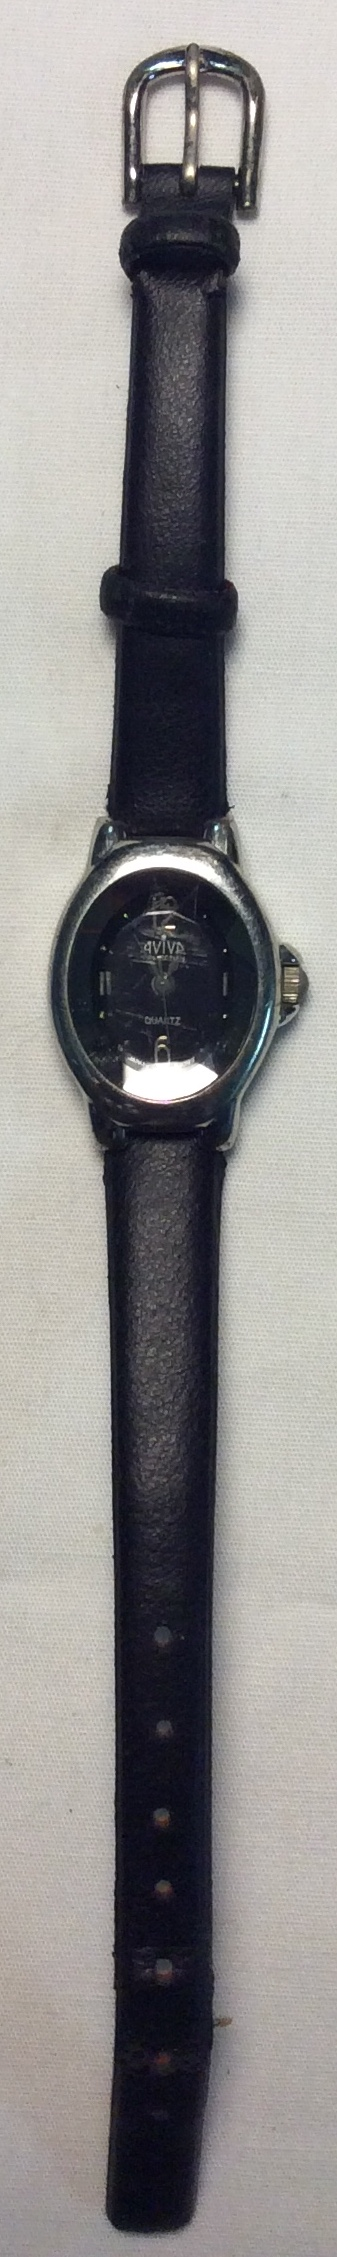 Aviva watch - Oval black face